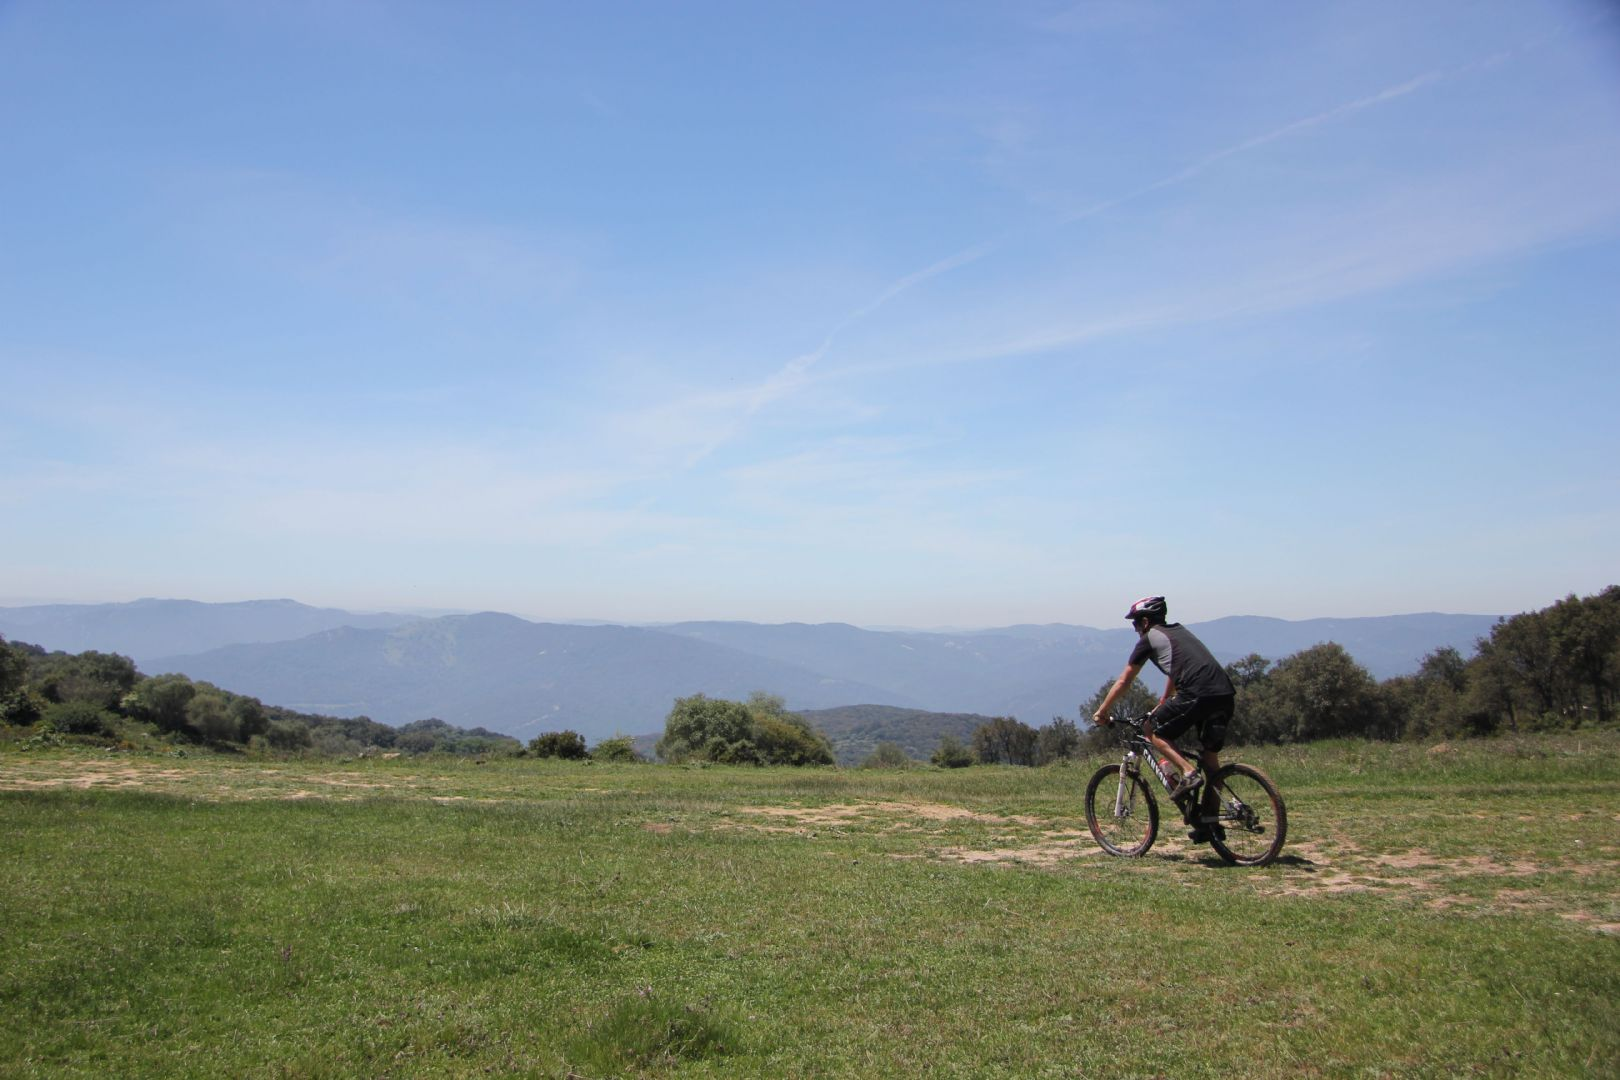 IMG_9241.JPG - Spain - Trans Andaluz - Mountain Biking